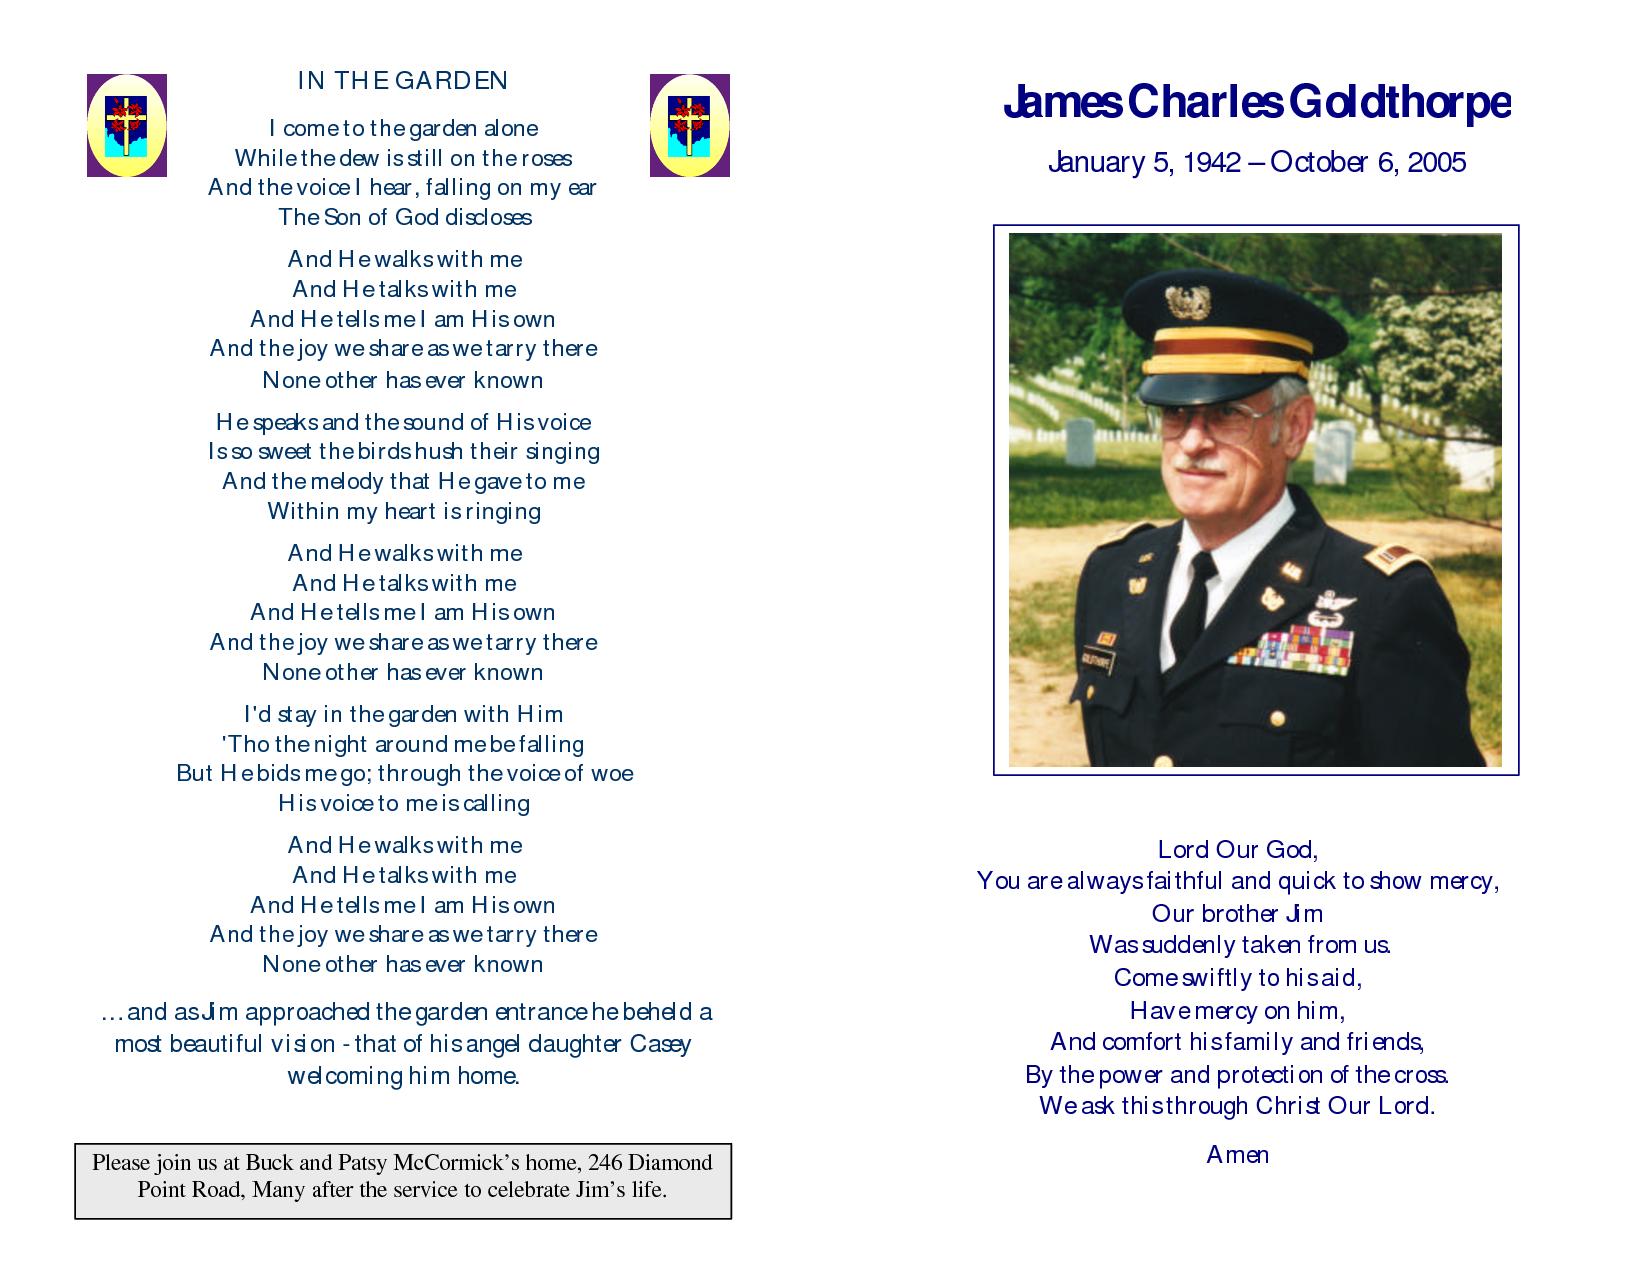 memorial service programs sample | First Baptist Church Bulletin ...